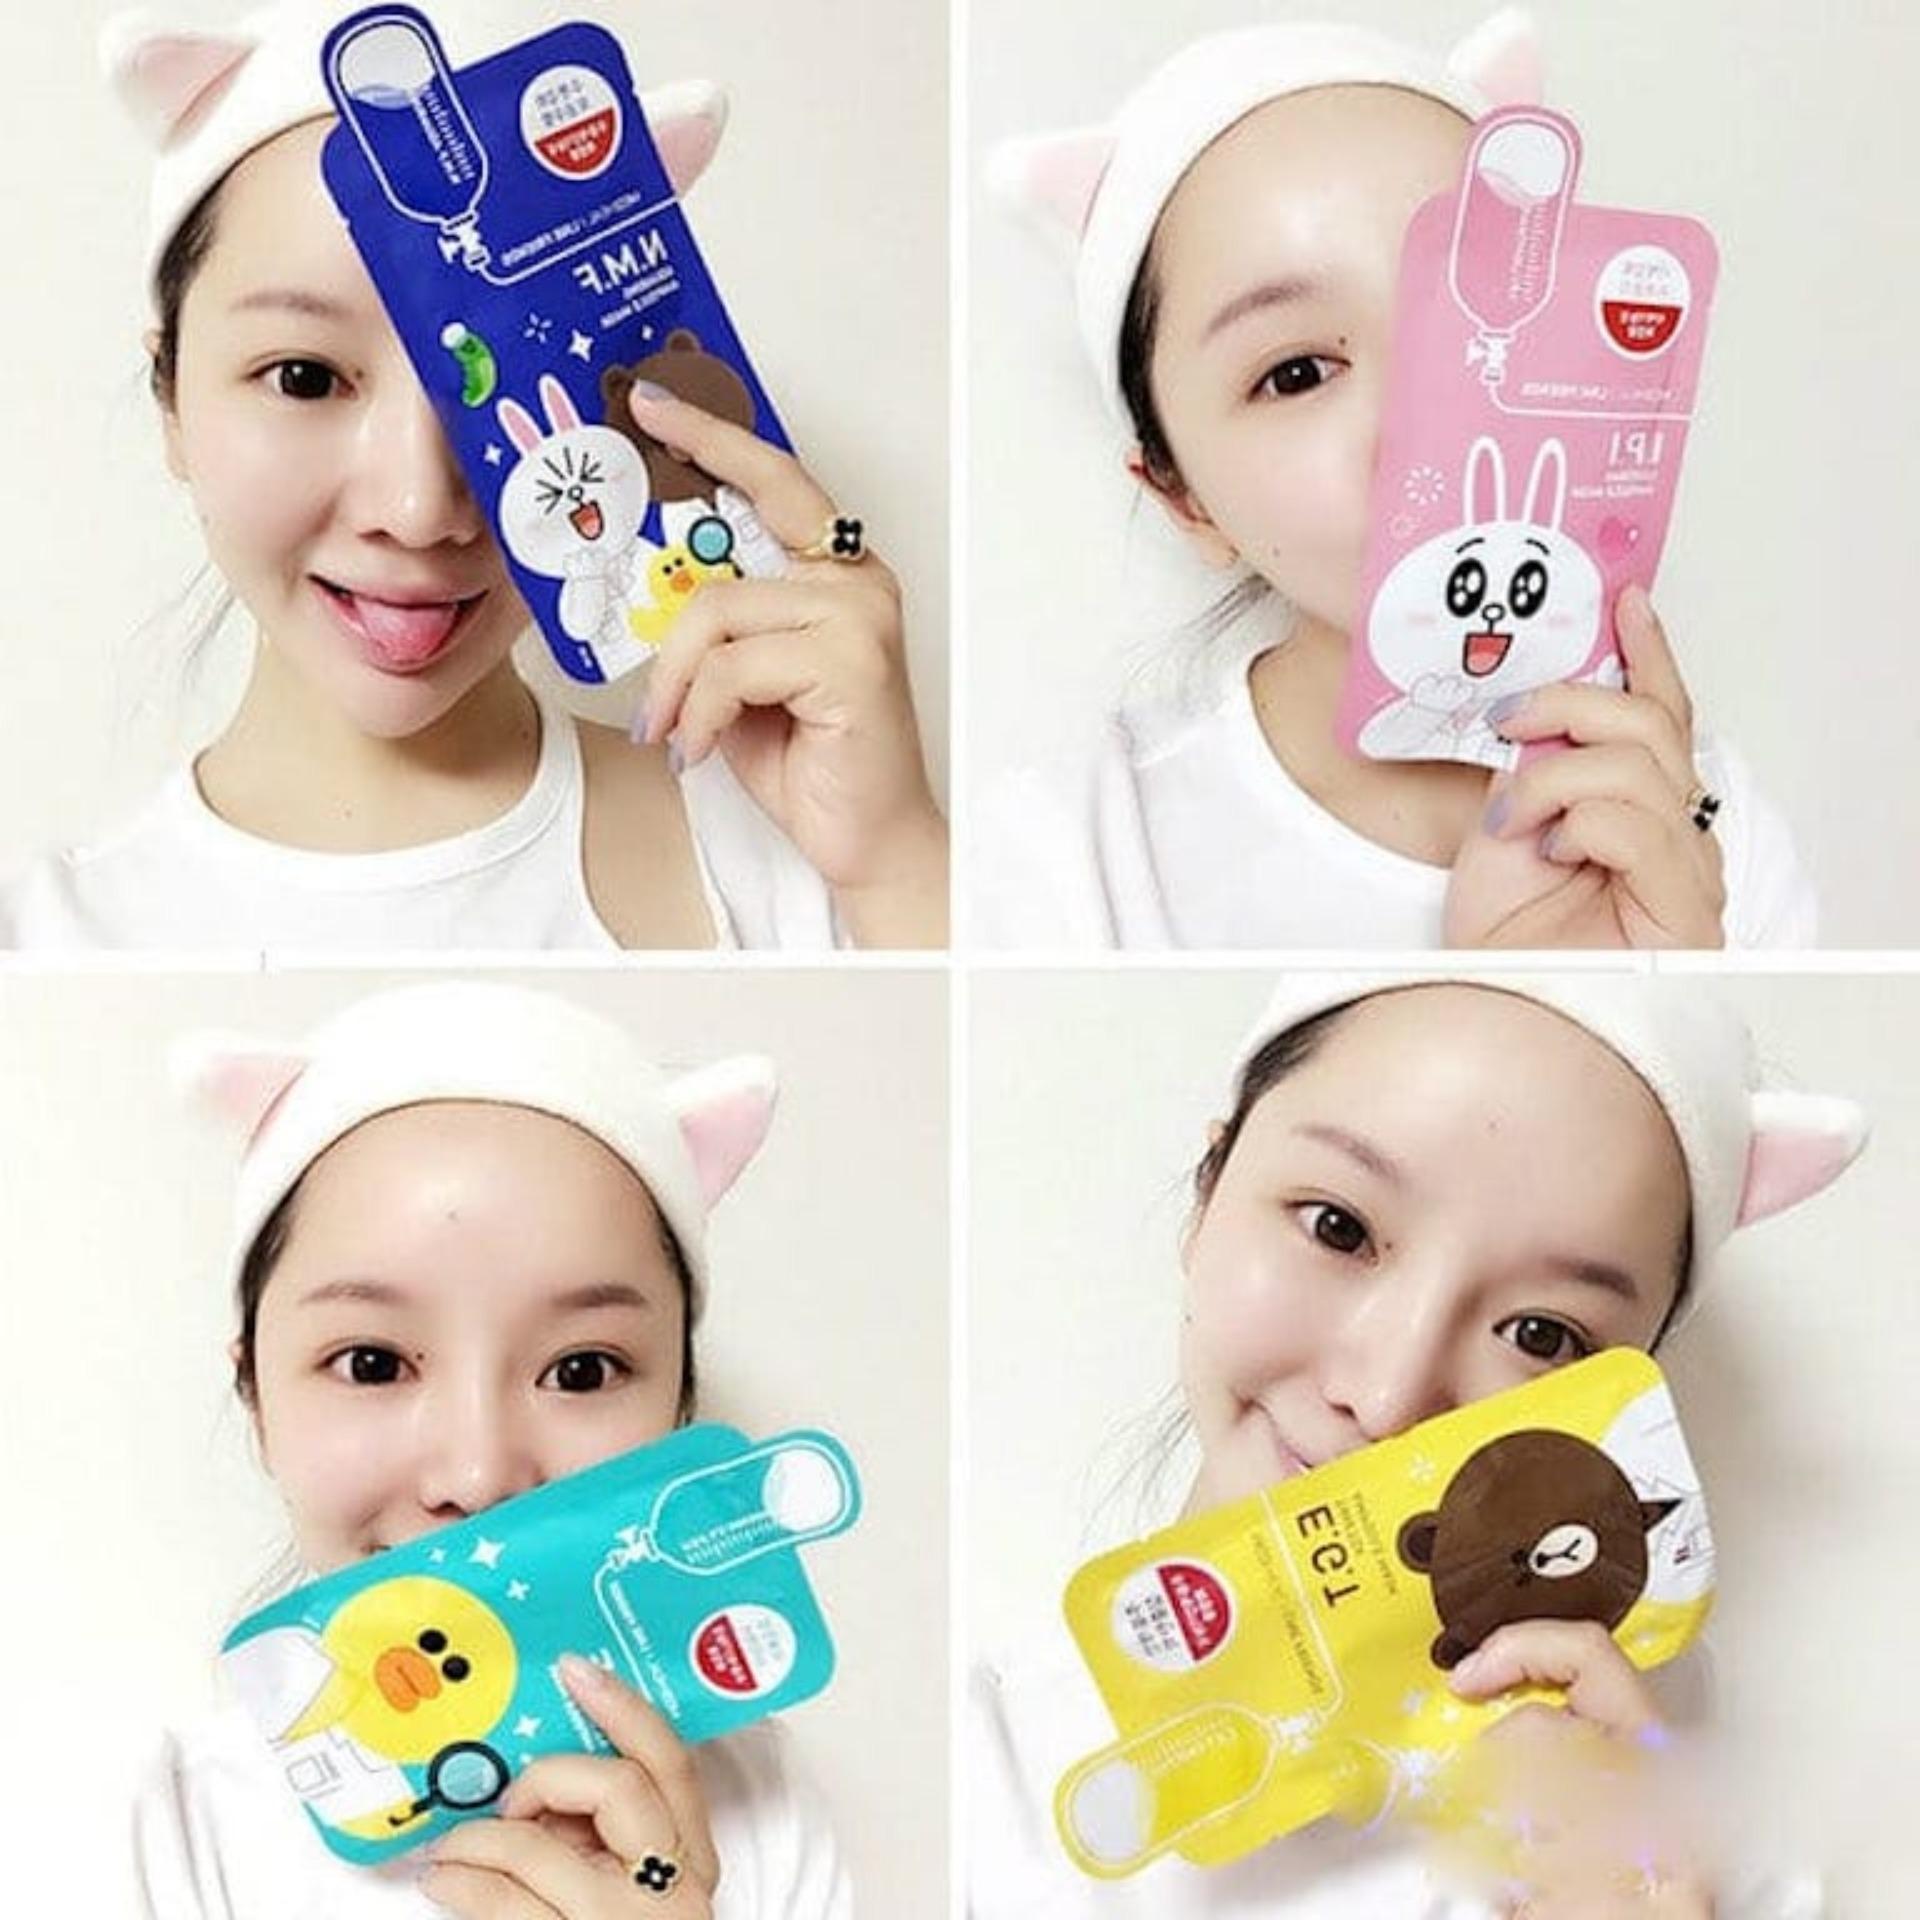 Mua Uy Tn Mt N Giy Dng Da Mediheal Line Friends Ampoule Mask Hp 10 Ming